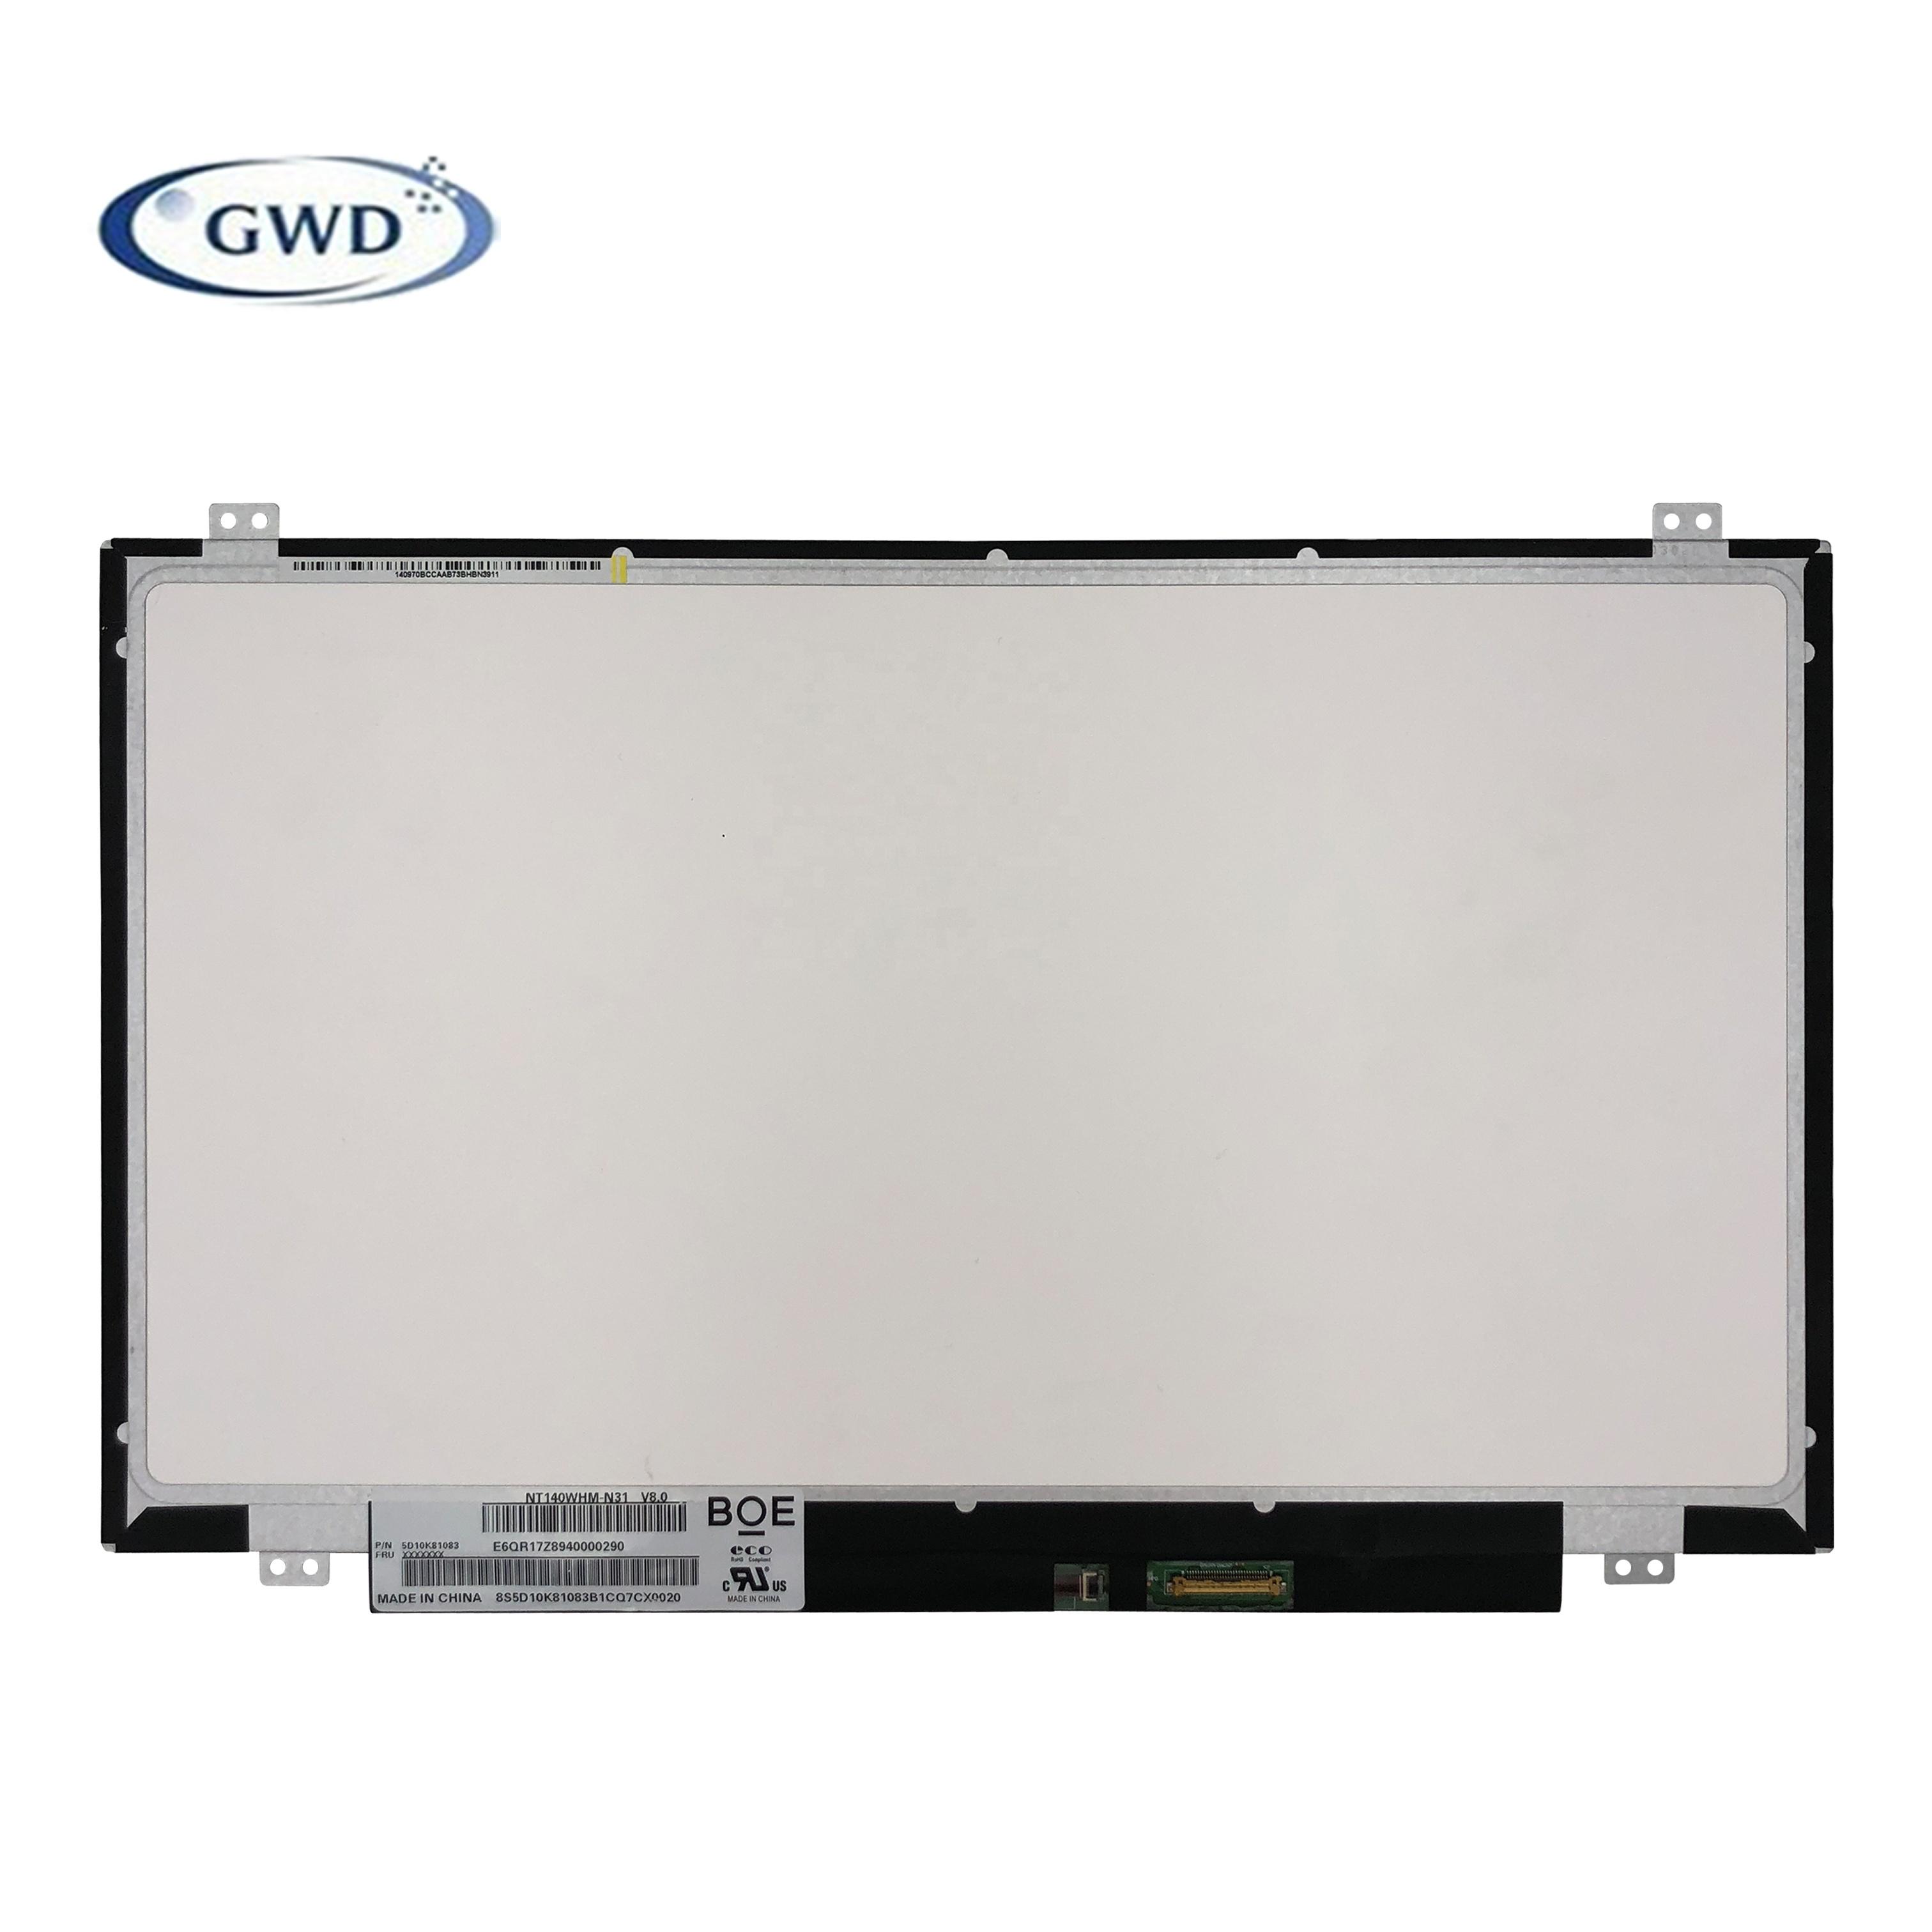 "R181H NEW Dell Inspiron Mini 9 910 Black 8.9/"" LCD Lid DPN"